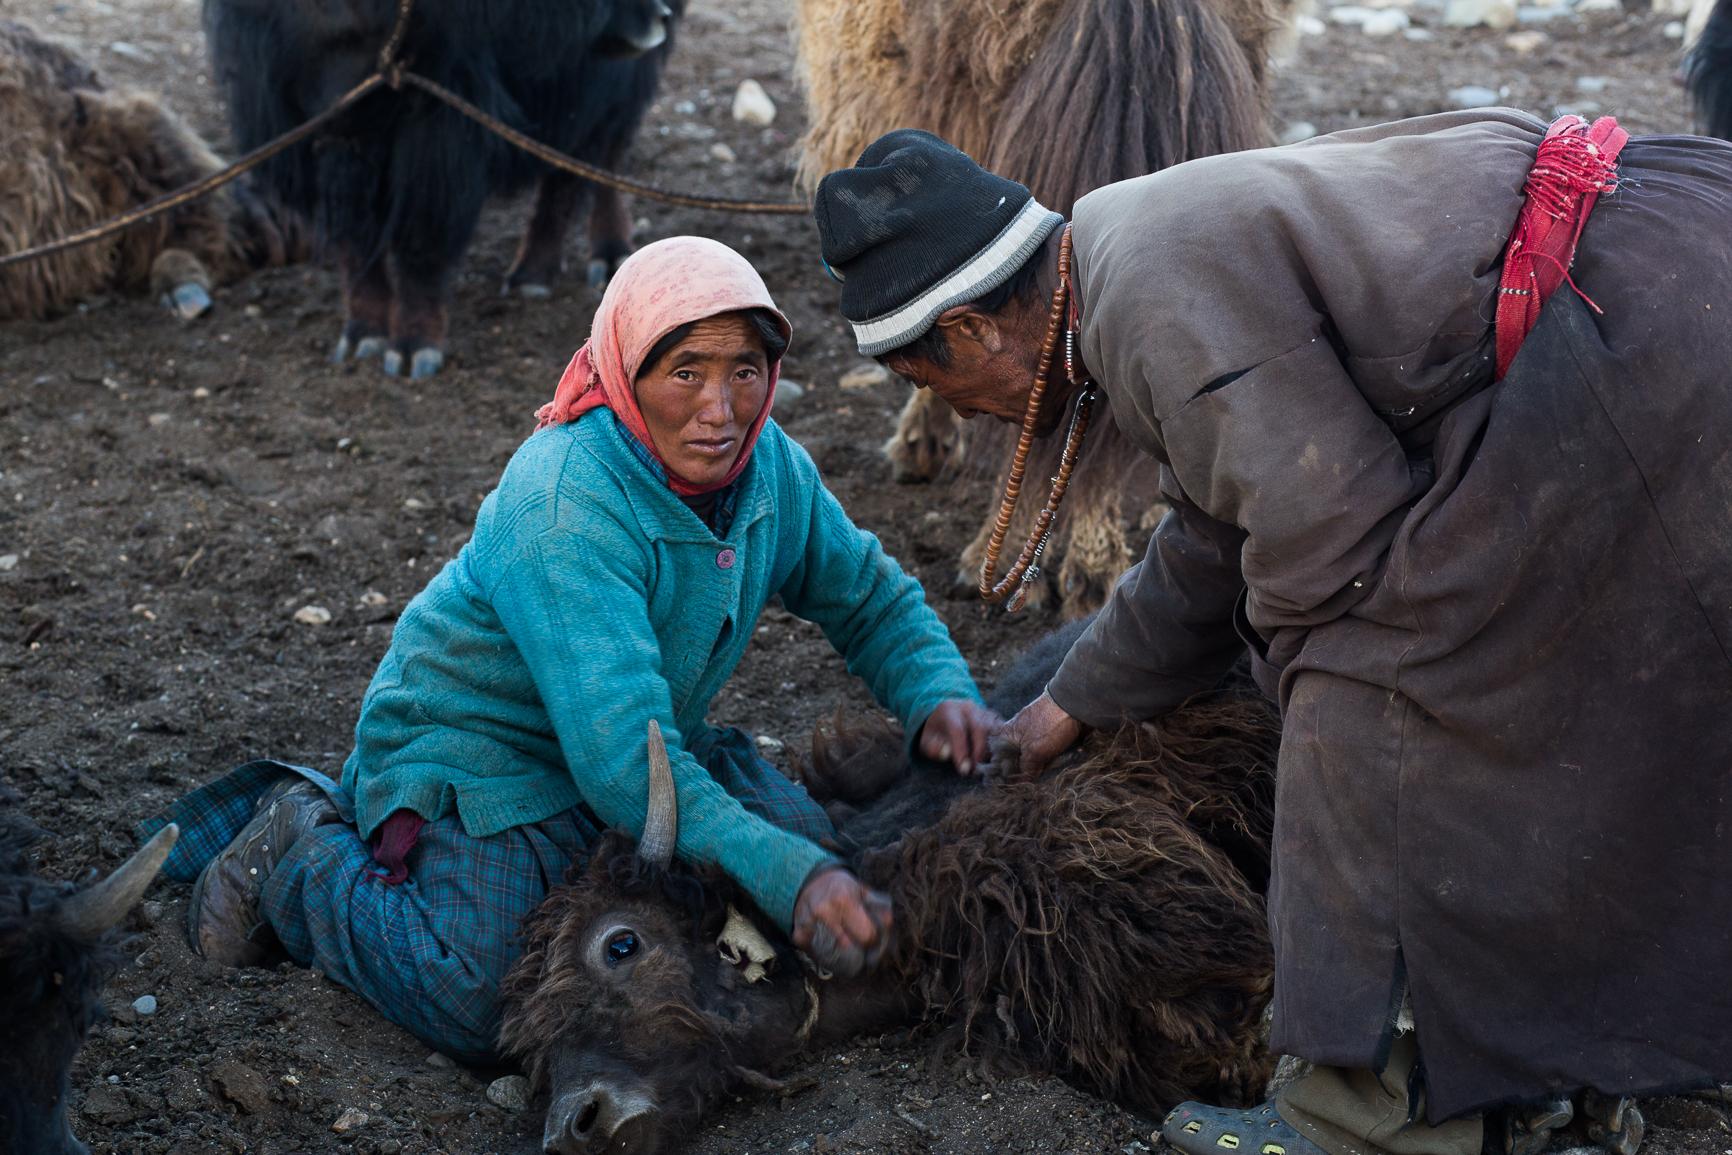 Irie_Langlois_Ladakh2.jpg